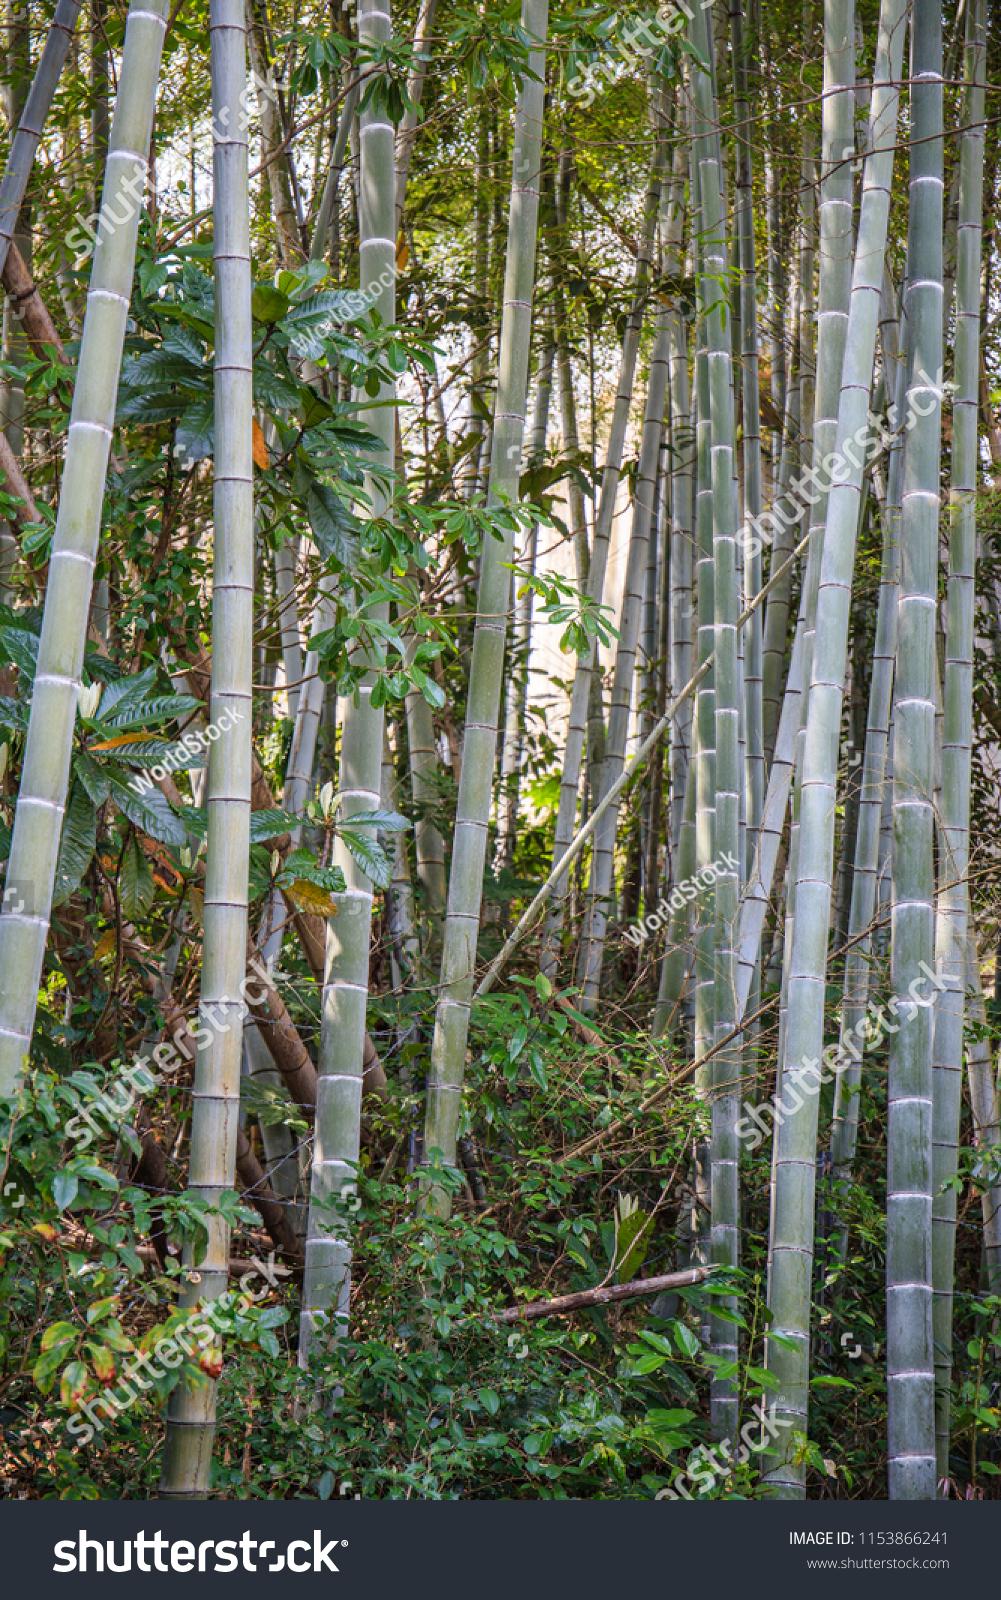 Dark Dense Tangled Bamboo Forest Mountain Nature Stock Image 1153866241